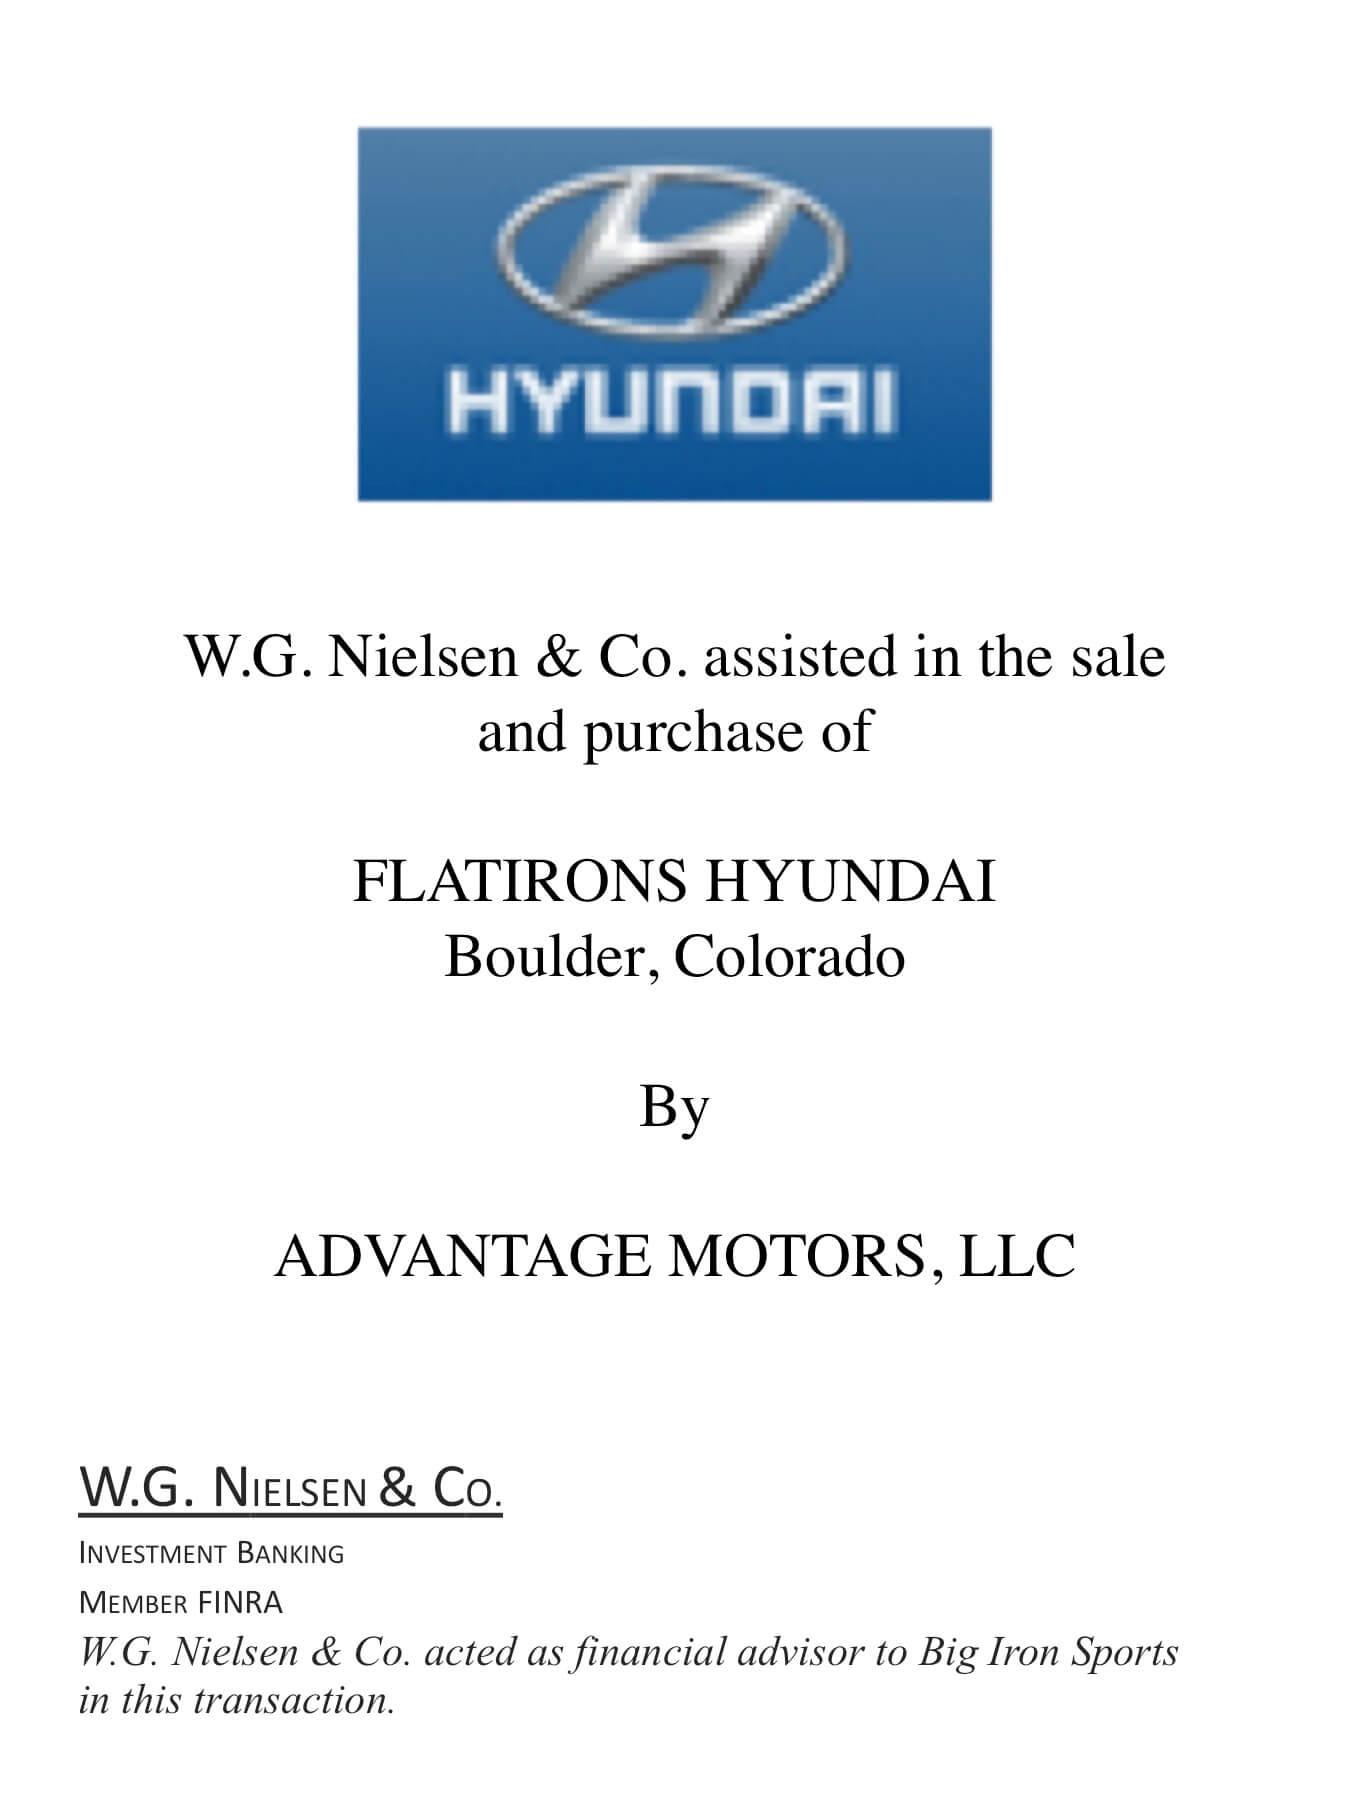 hyundai investment banking transaction